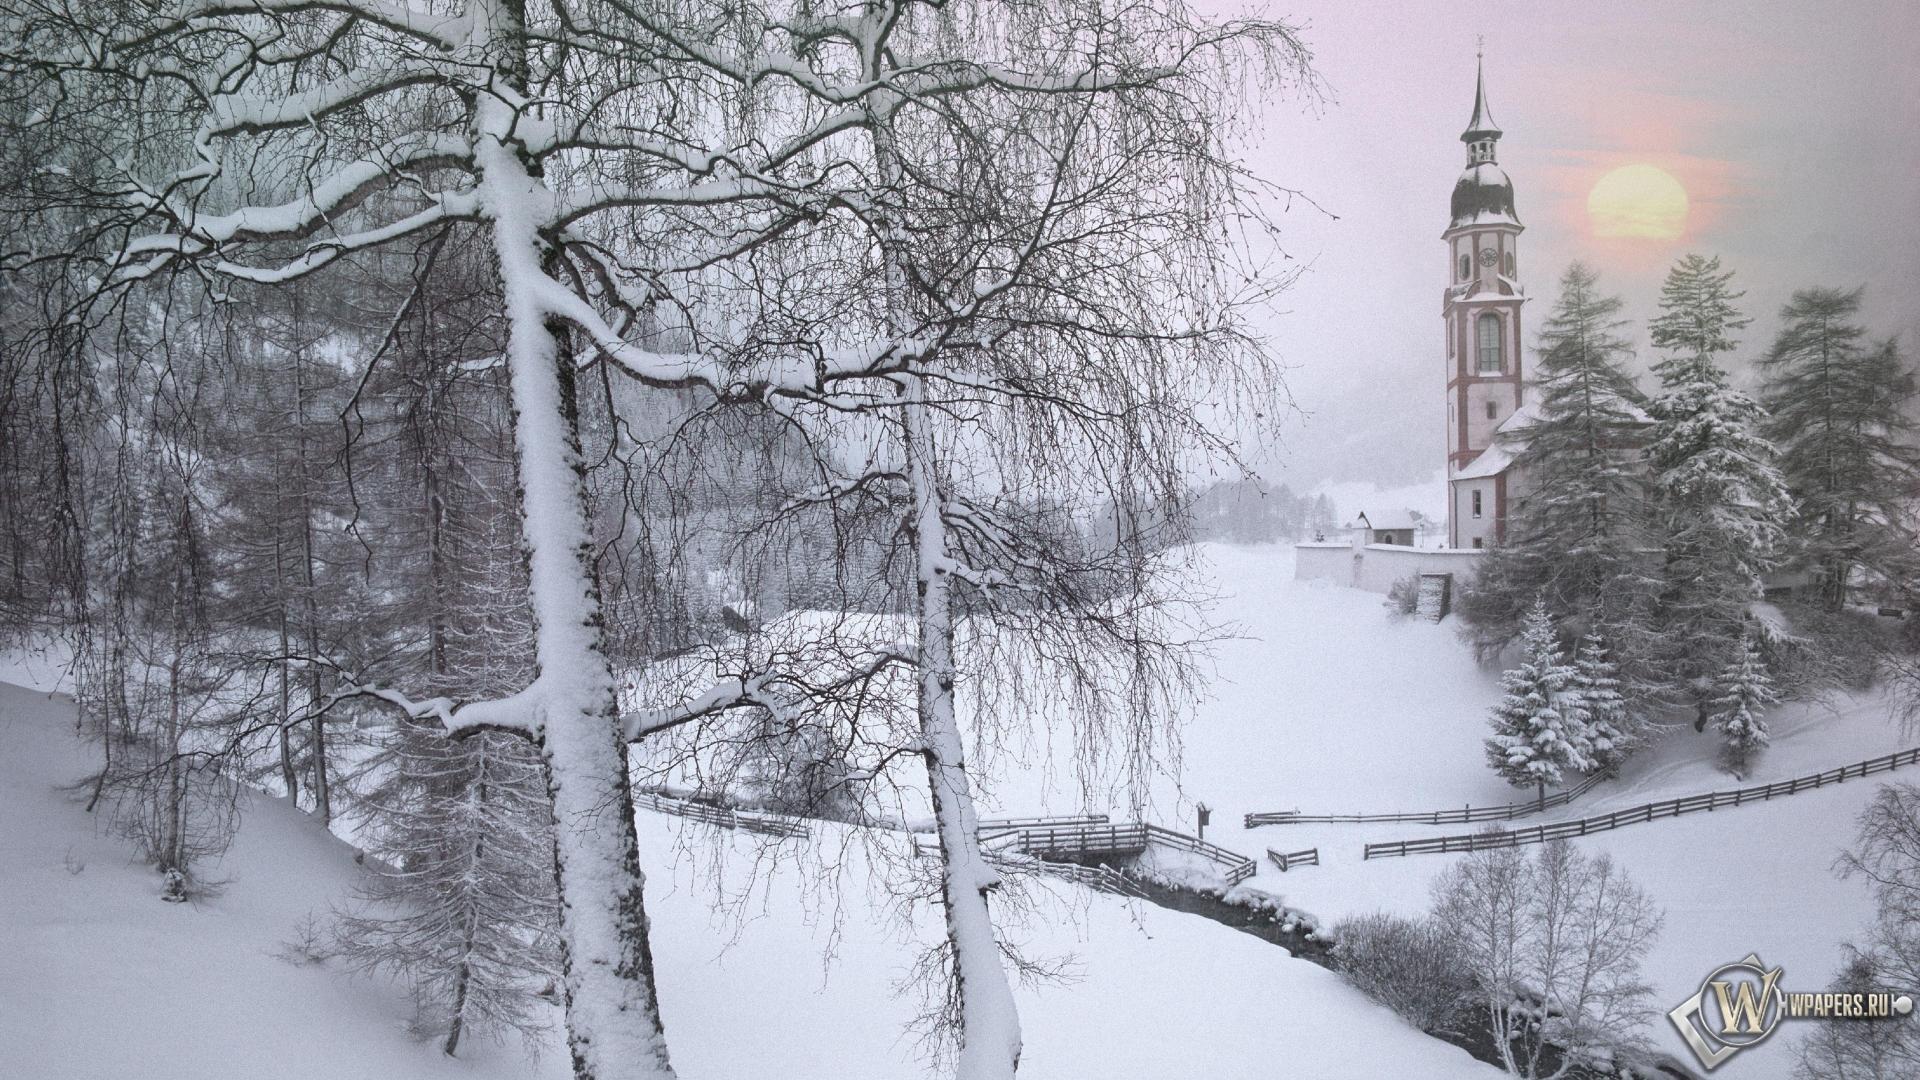 Зима в Тироле Австрия 1920x1080